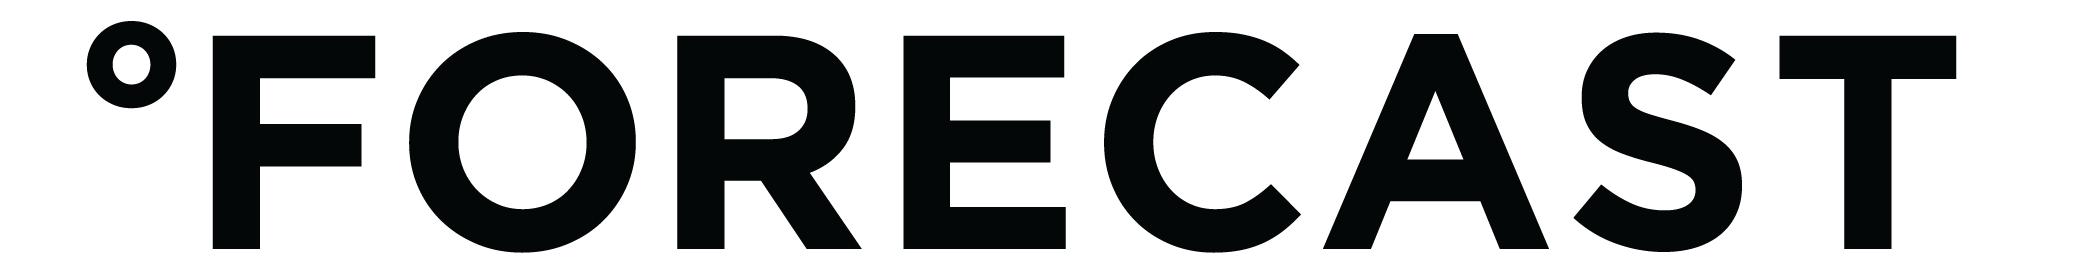 forecast_logo.png